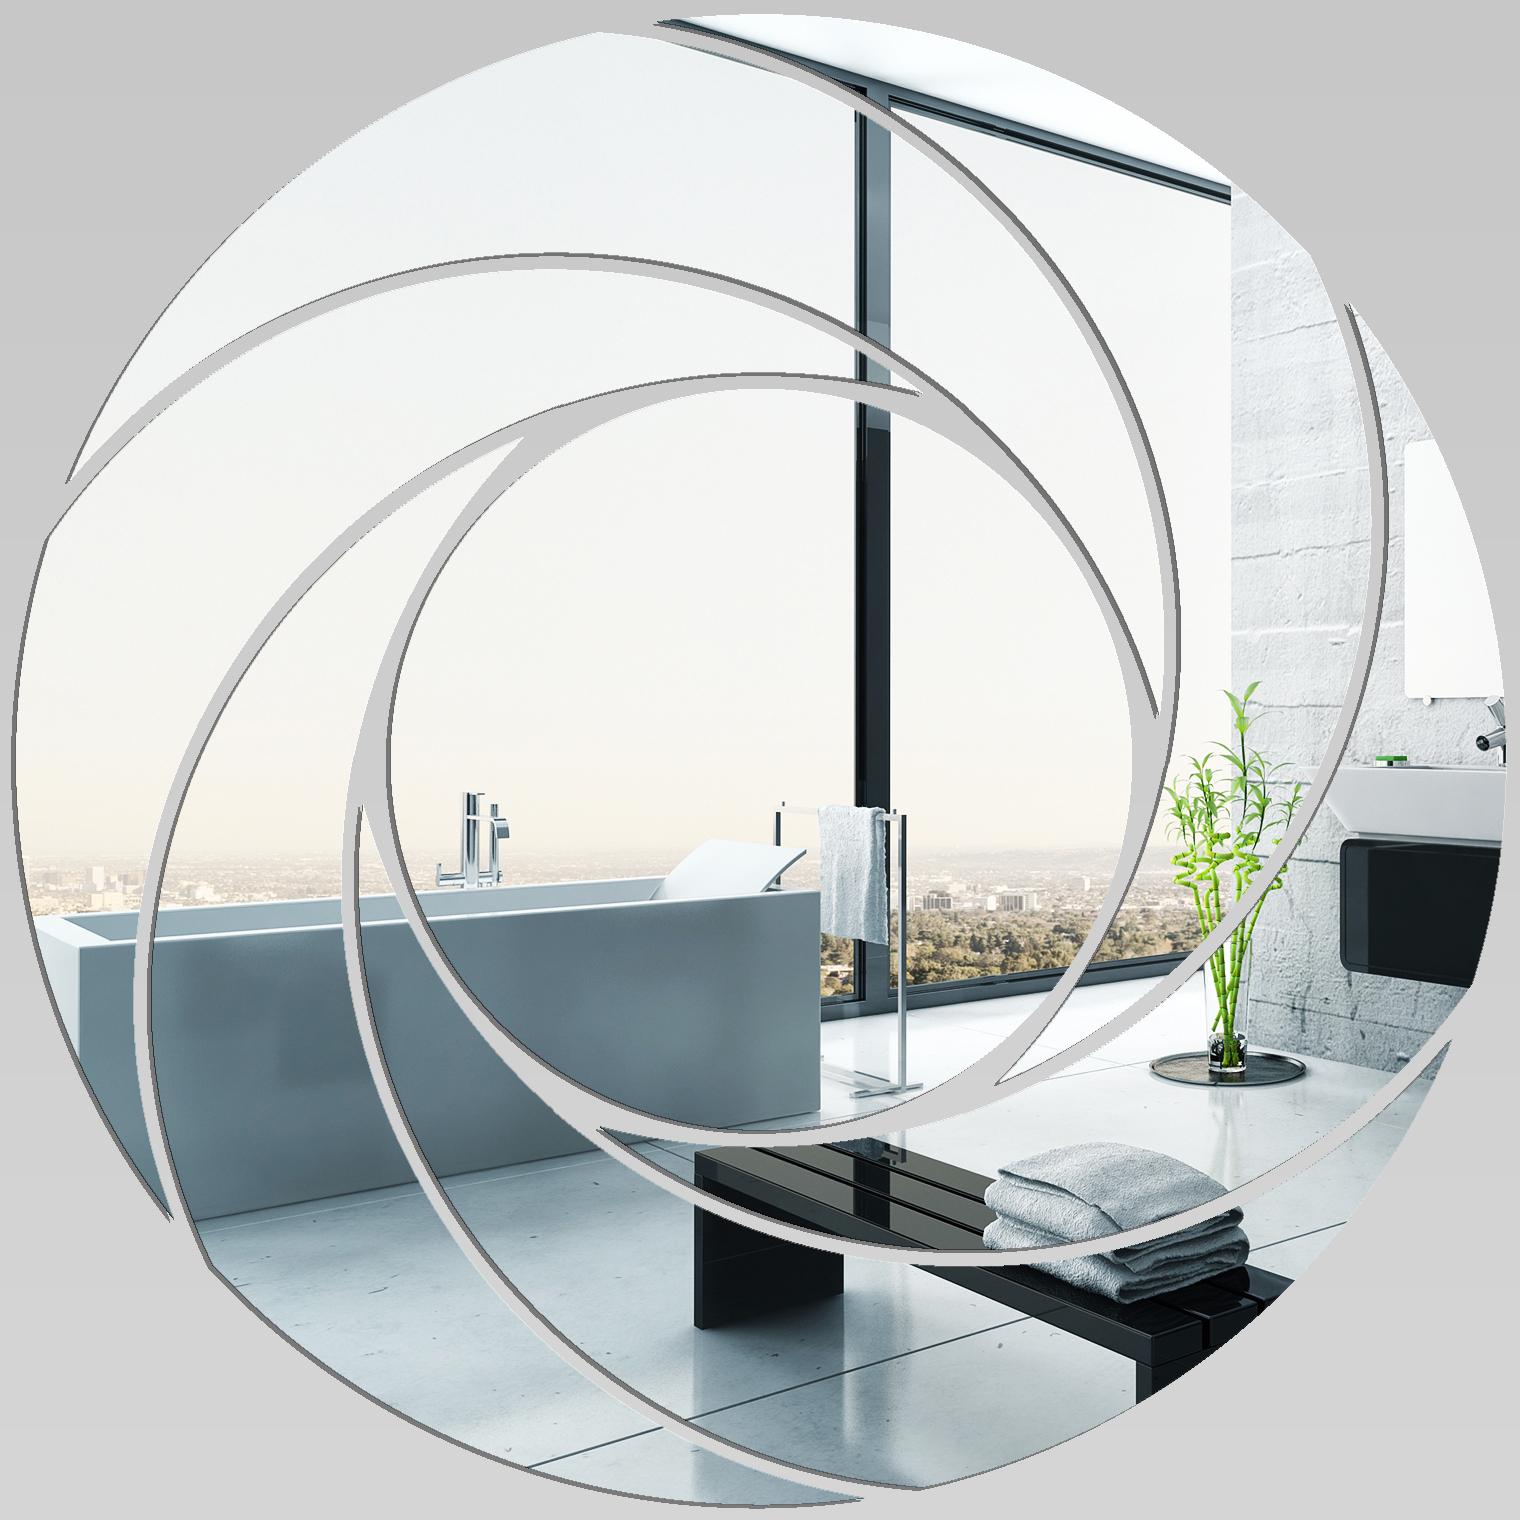 Wandtattoos folies wandspiegel aus acrylglas spirale design - Wandspiegel design ...